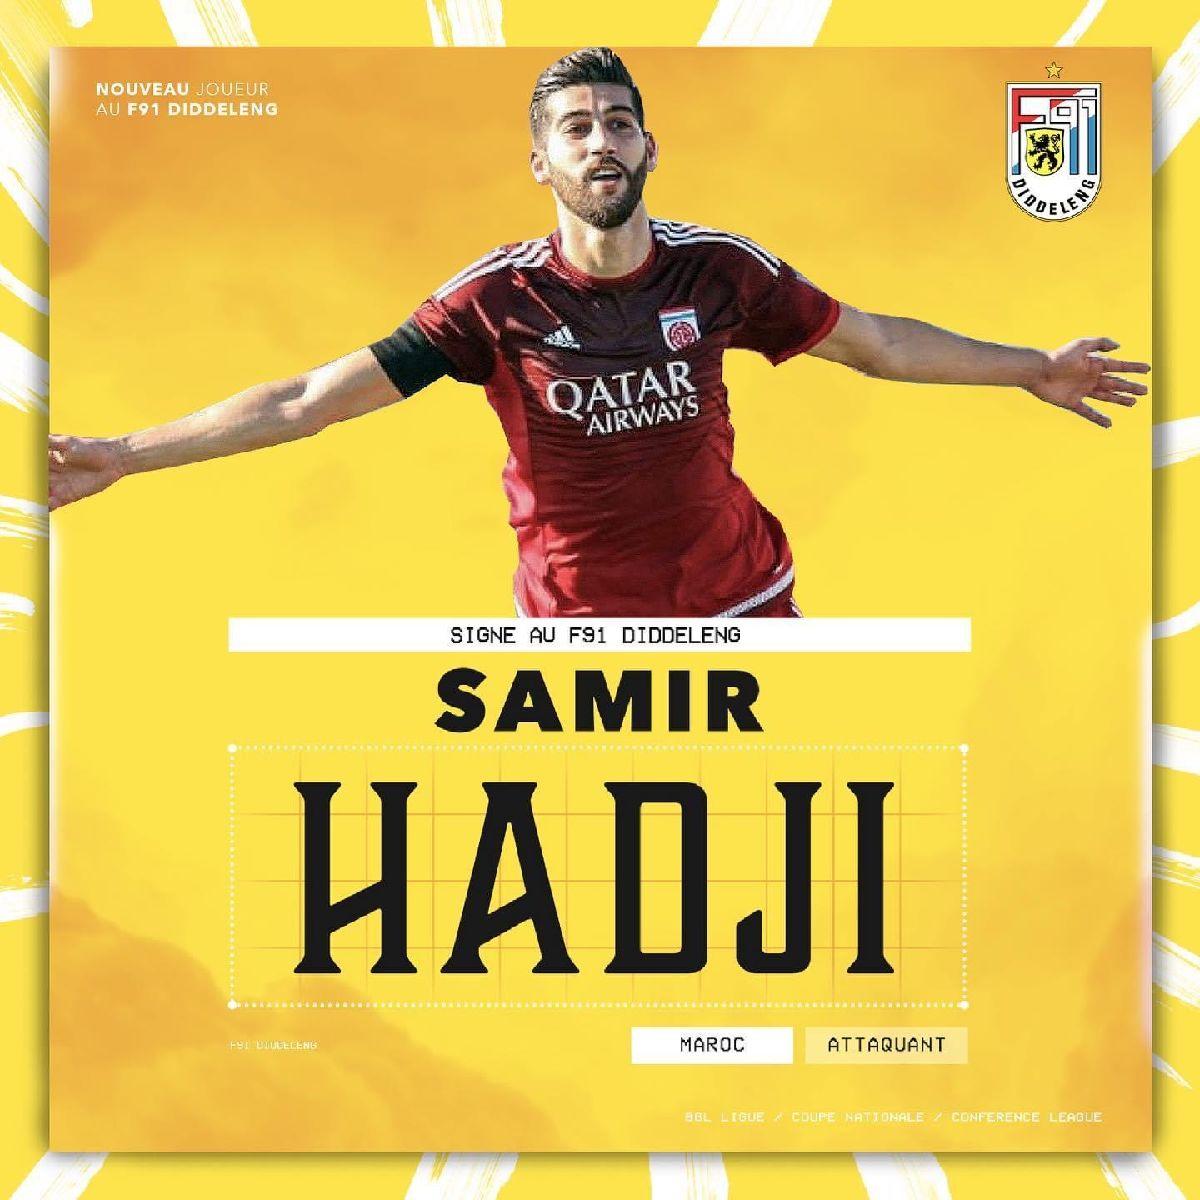 Samir Hadji est dudelangeois